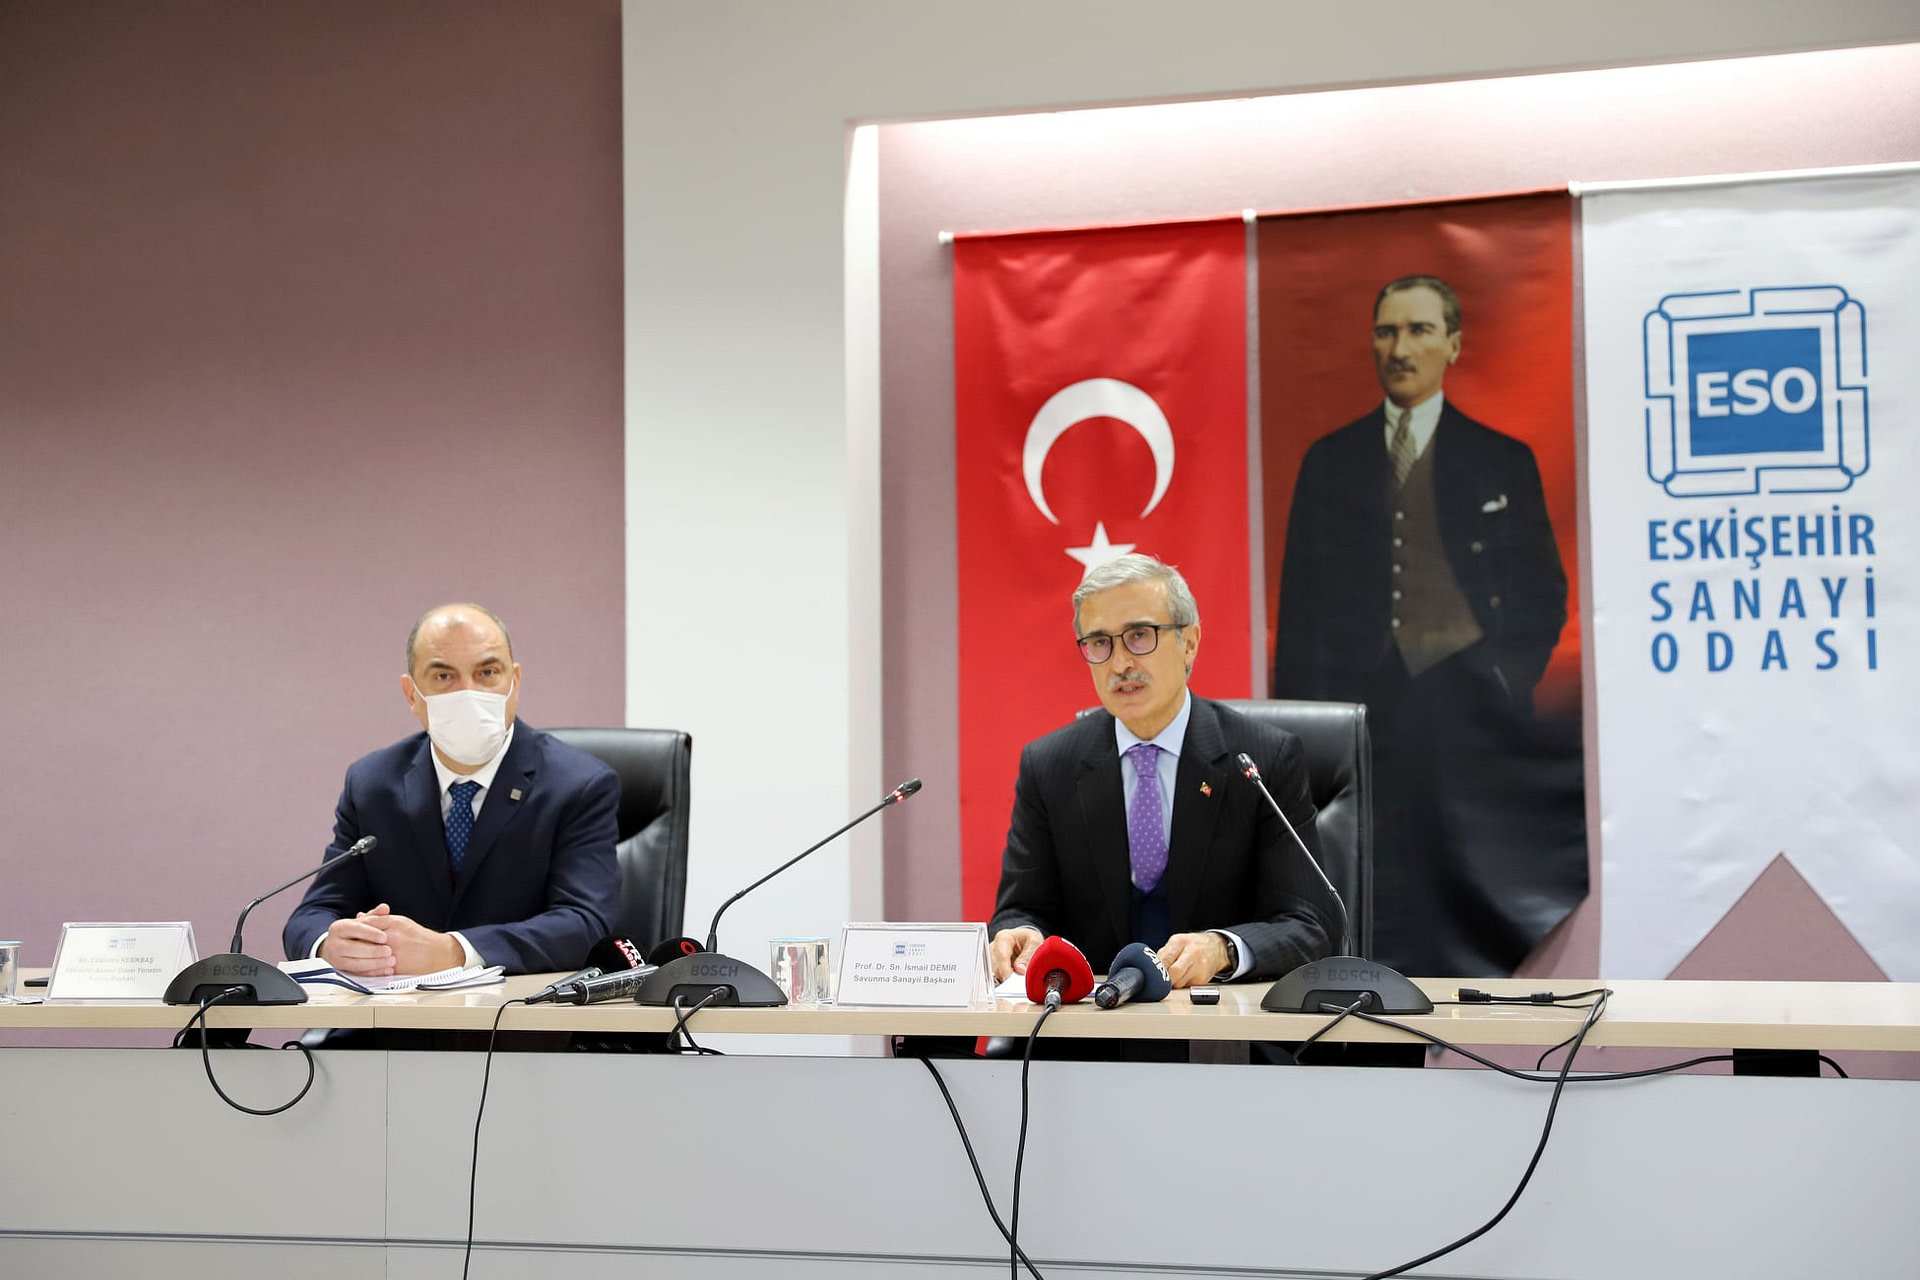 Savunma Sanayi Başkanı, Prof. Dr. İsmail Demir